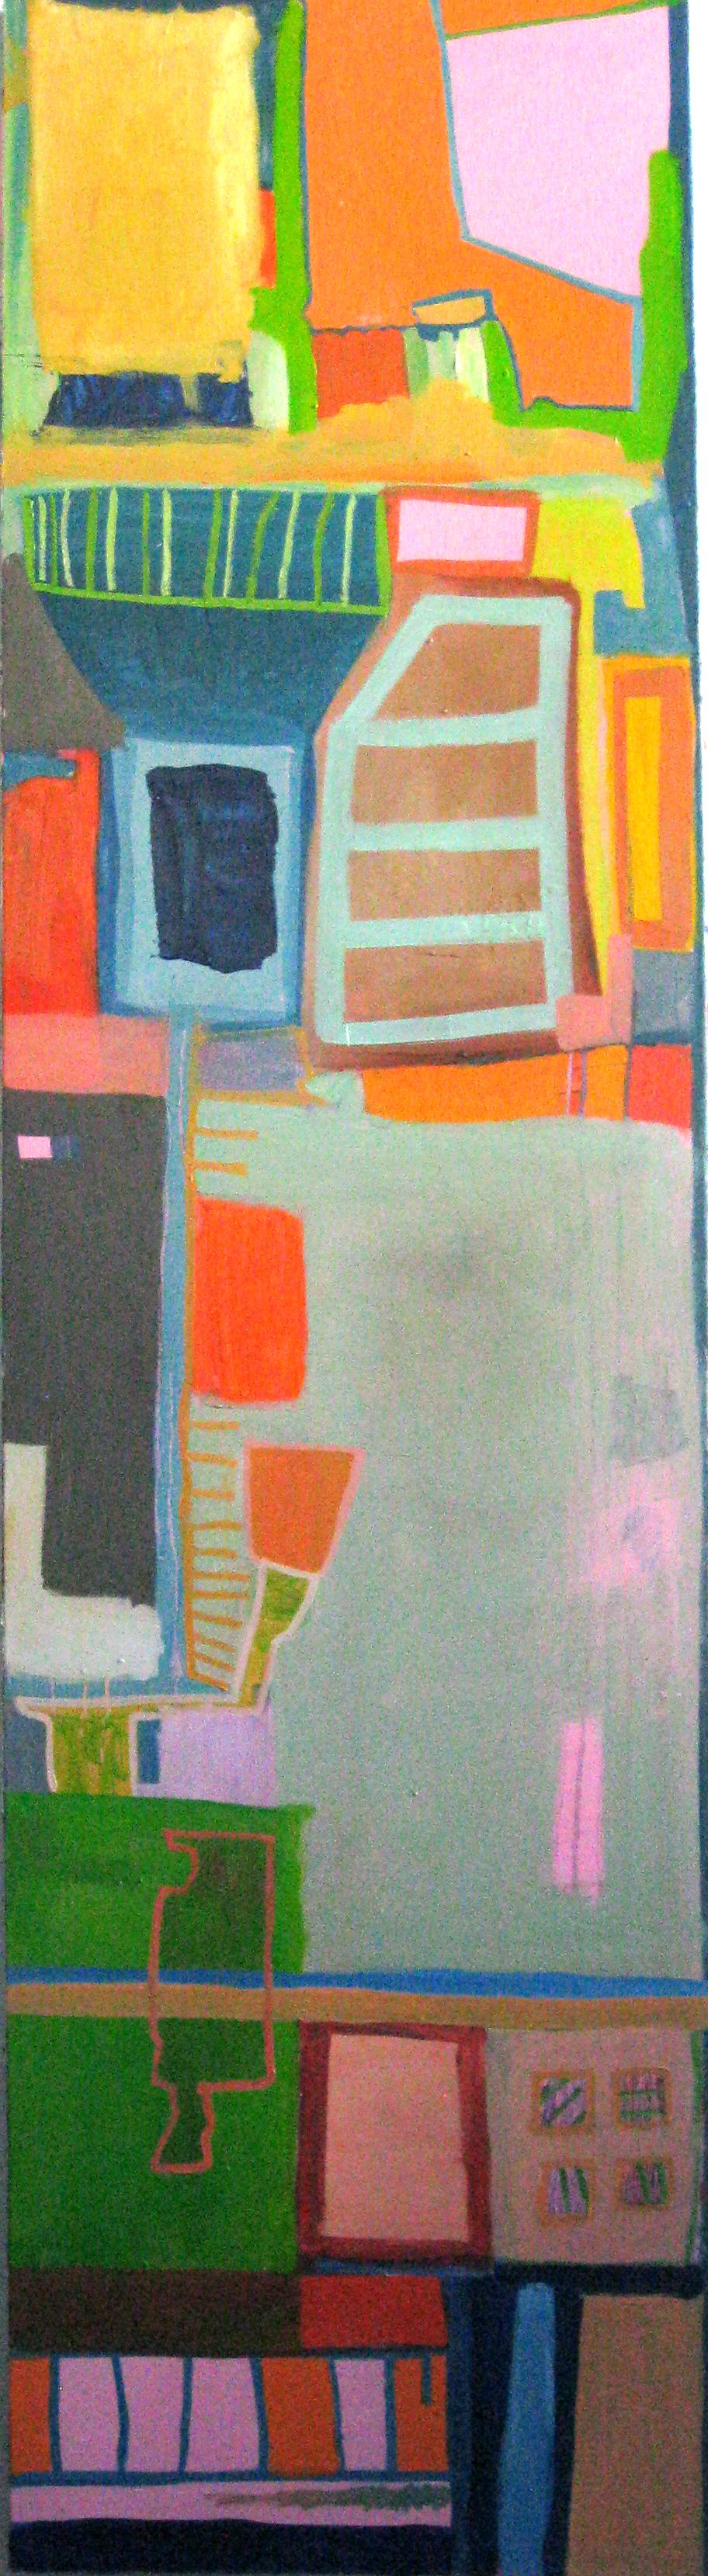 "The House on Mango Street.   Oil on Panel   17"" x 64""  2013"